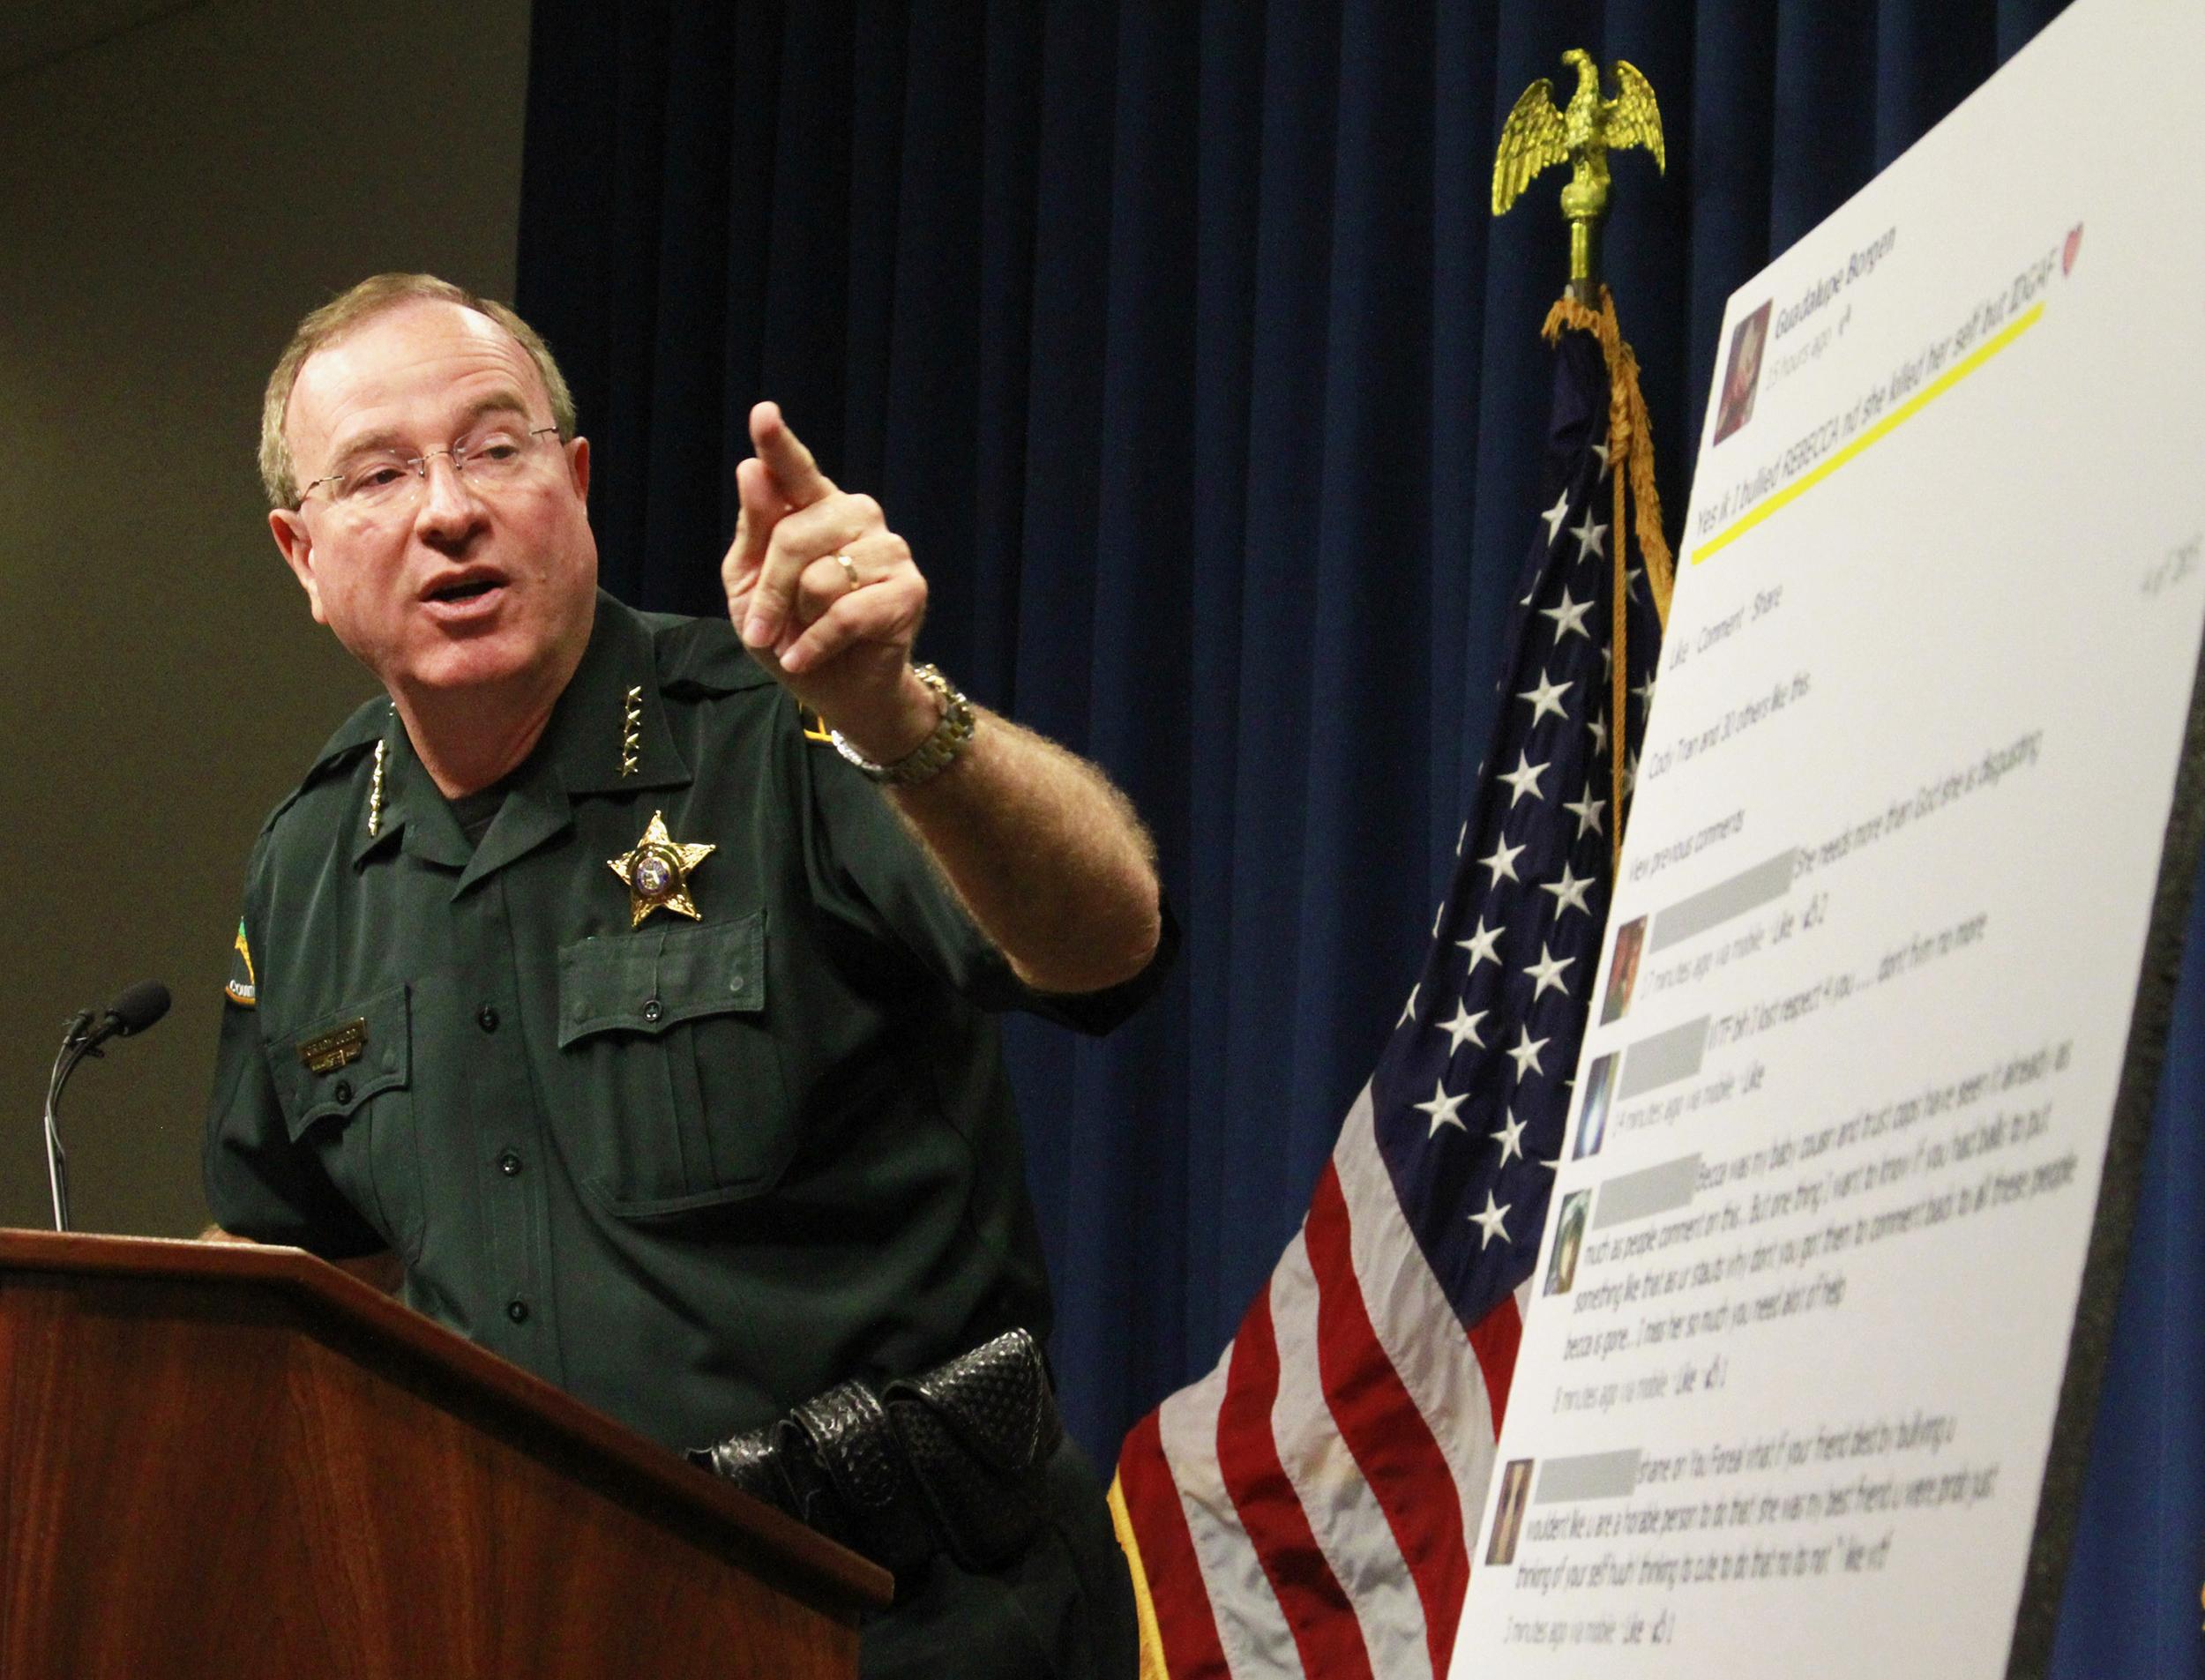 Image: Polk County, Florida, Sheriff Grady Judd